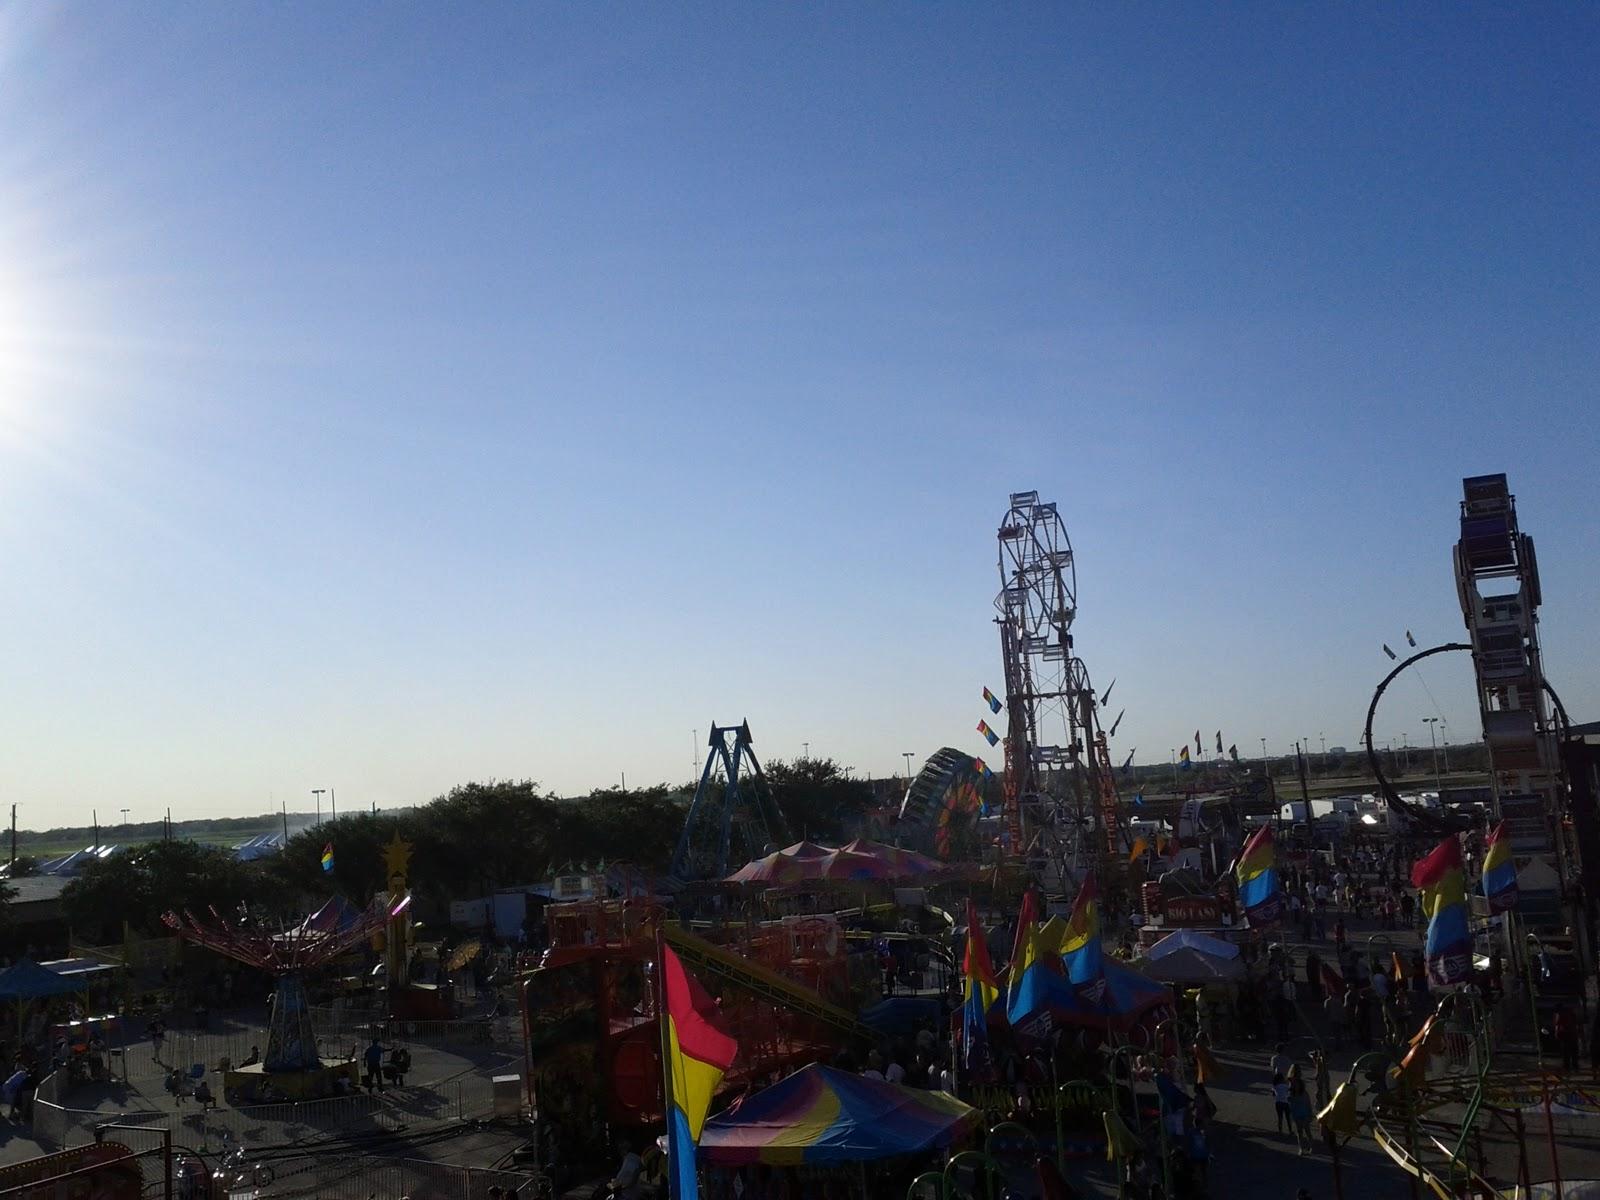 Fort Bend County Fair 2011 - IMG_20111001_174731.jpg